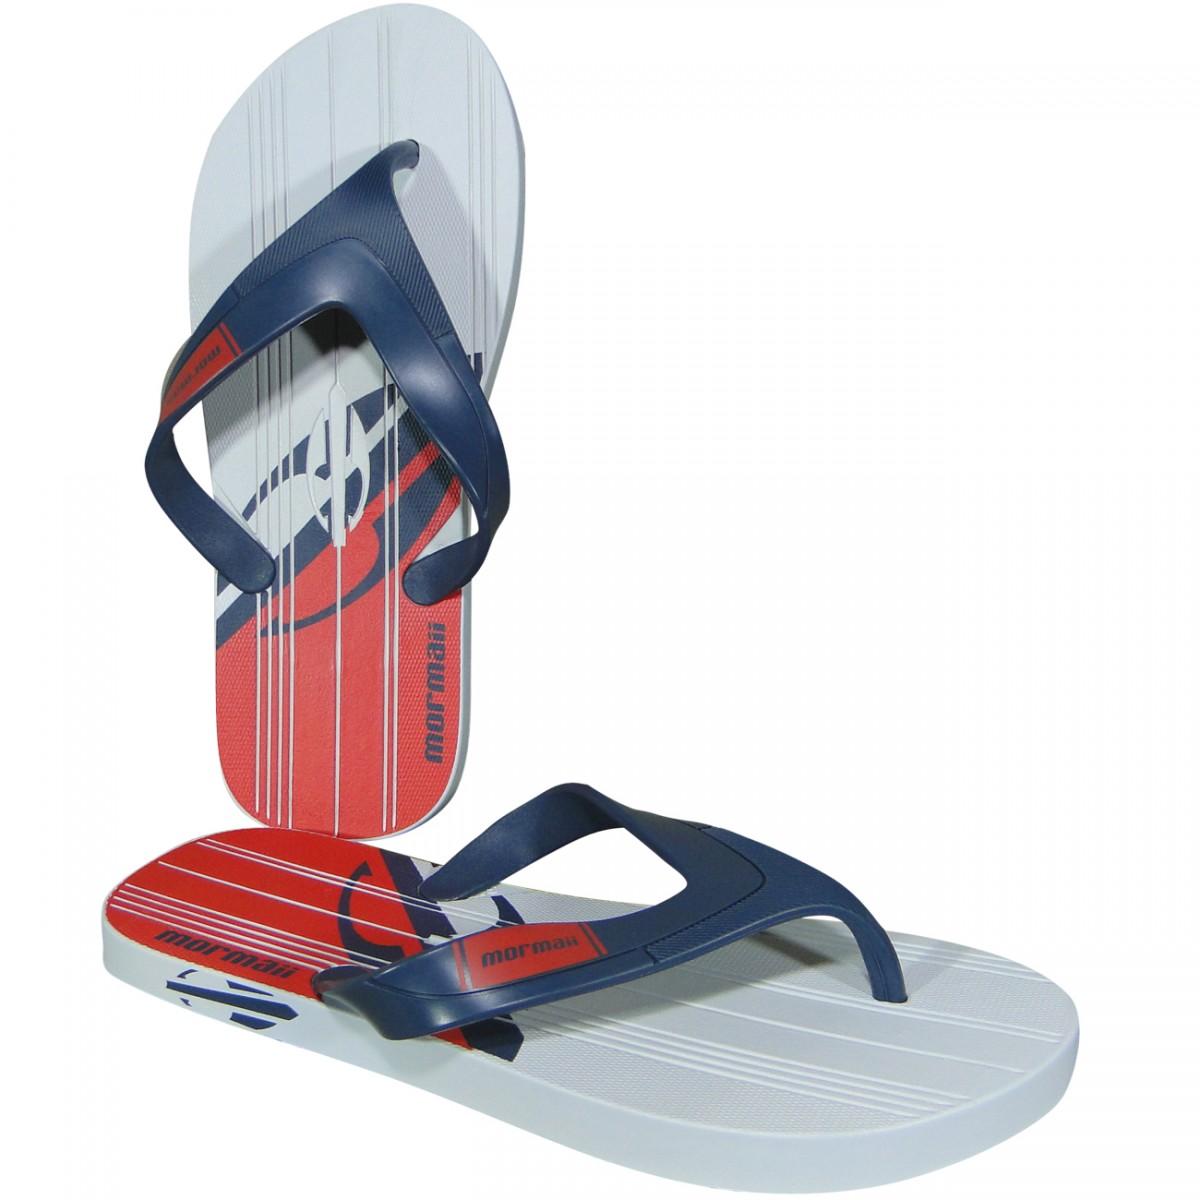 579adbd735 Chinelo Mormaii Tropical Pro 11060 11060 - 23648 - Branco Azul Vermelho -  Chuteira Nike